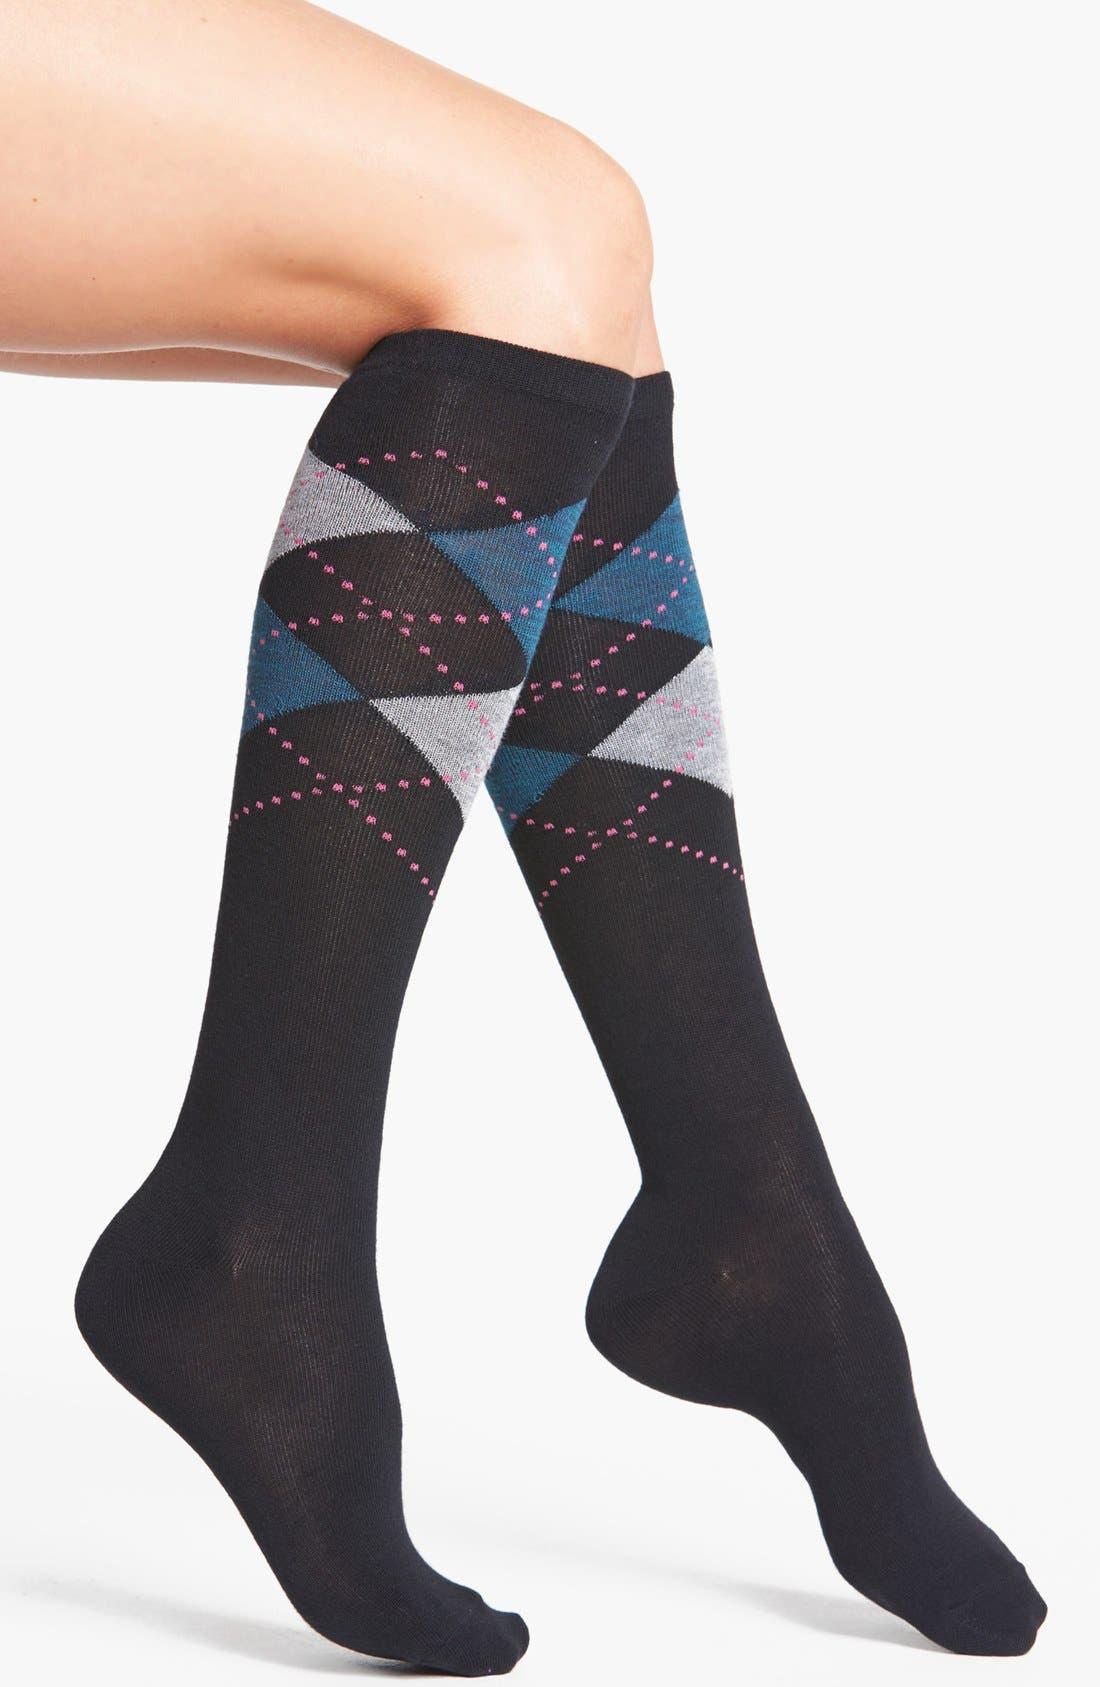 Alternate Image 1 Selected - Nordstrom 'Soft Touch' Argyle Knee Socks